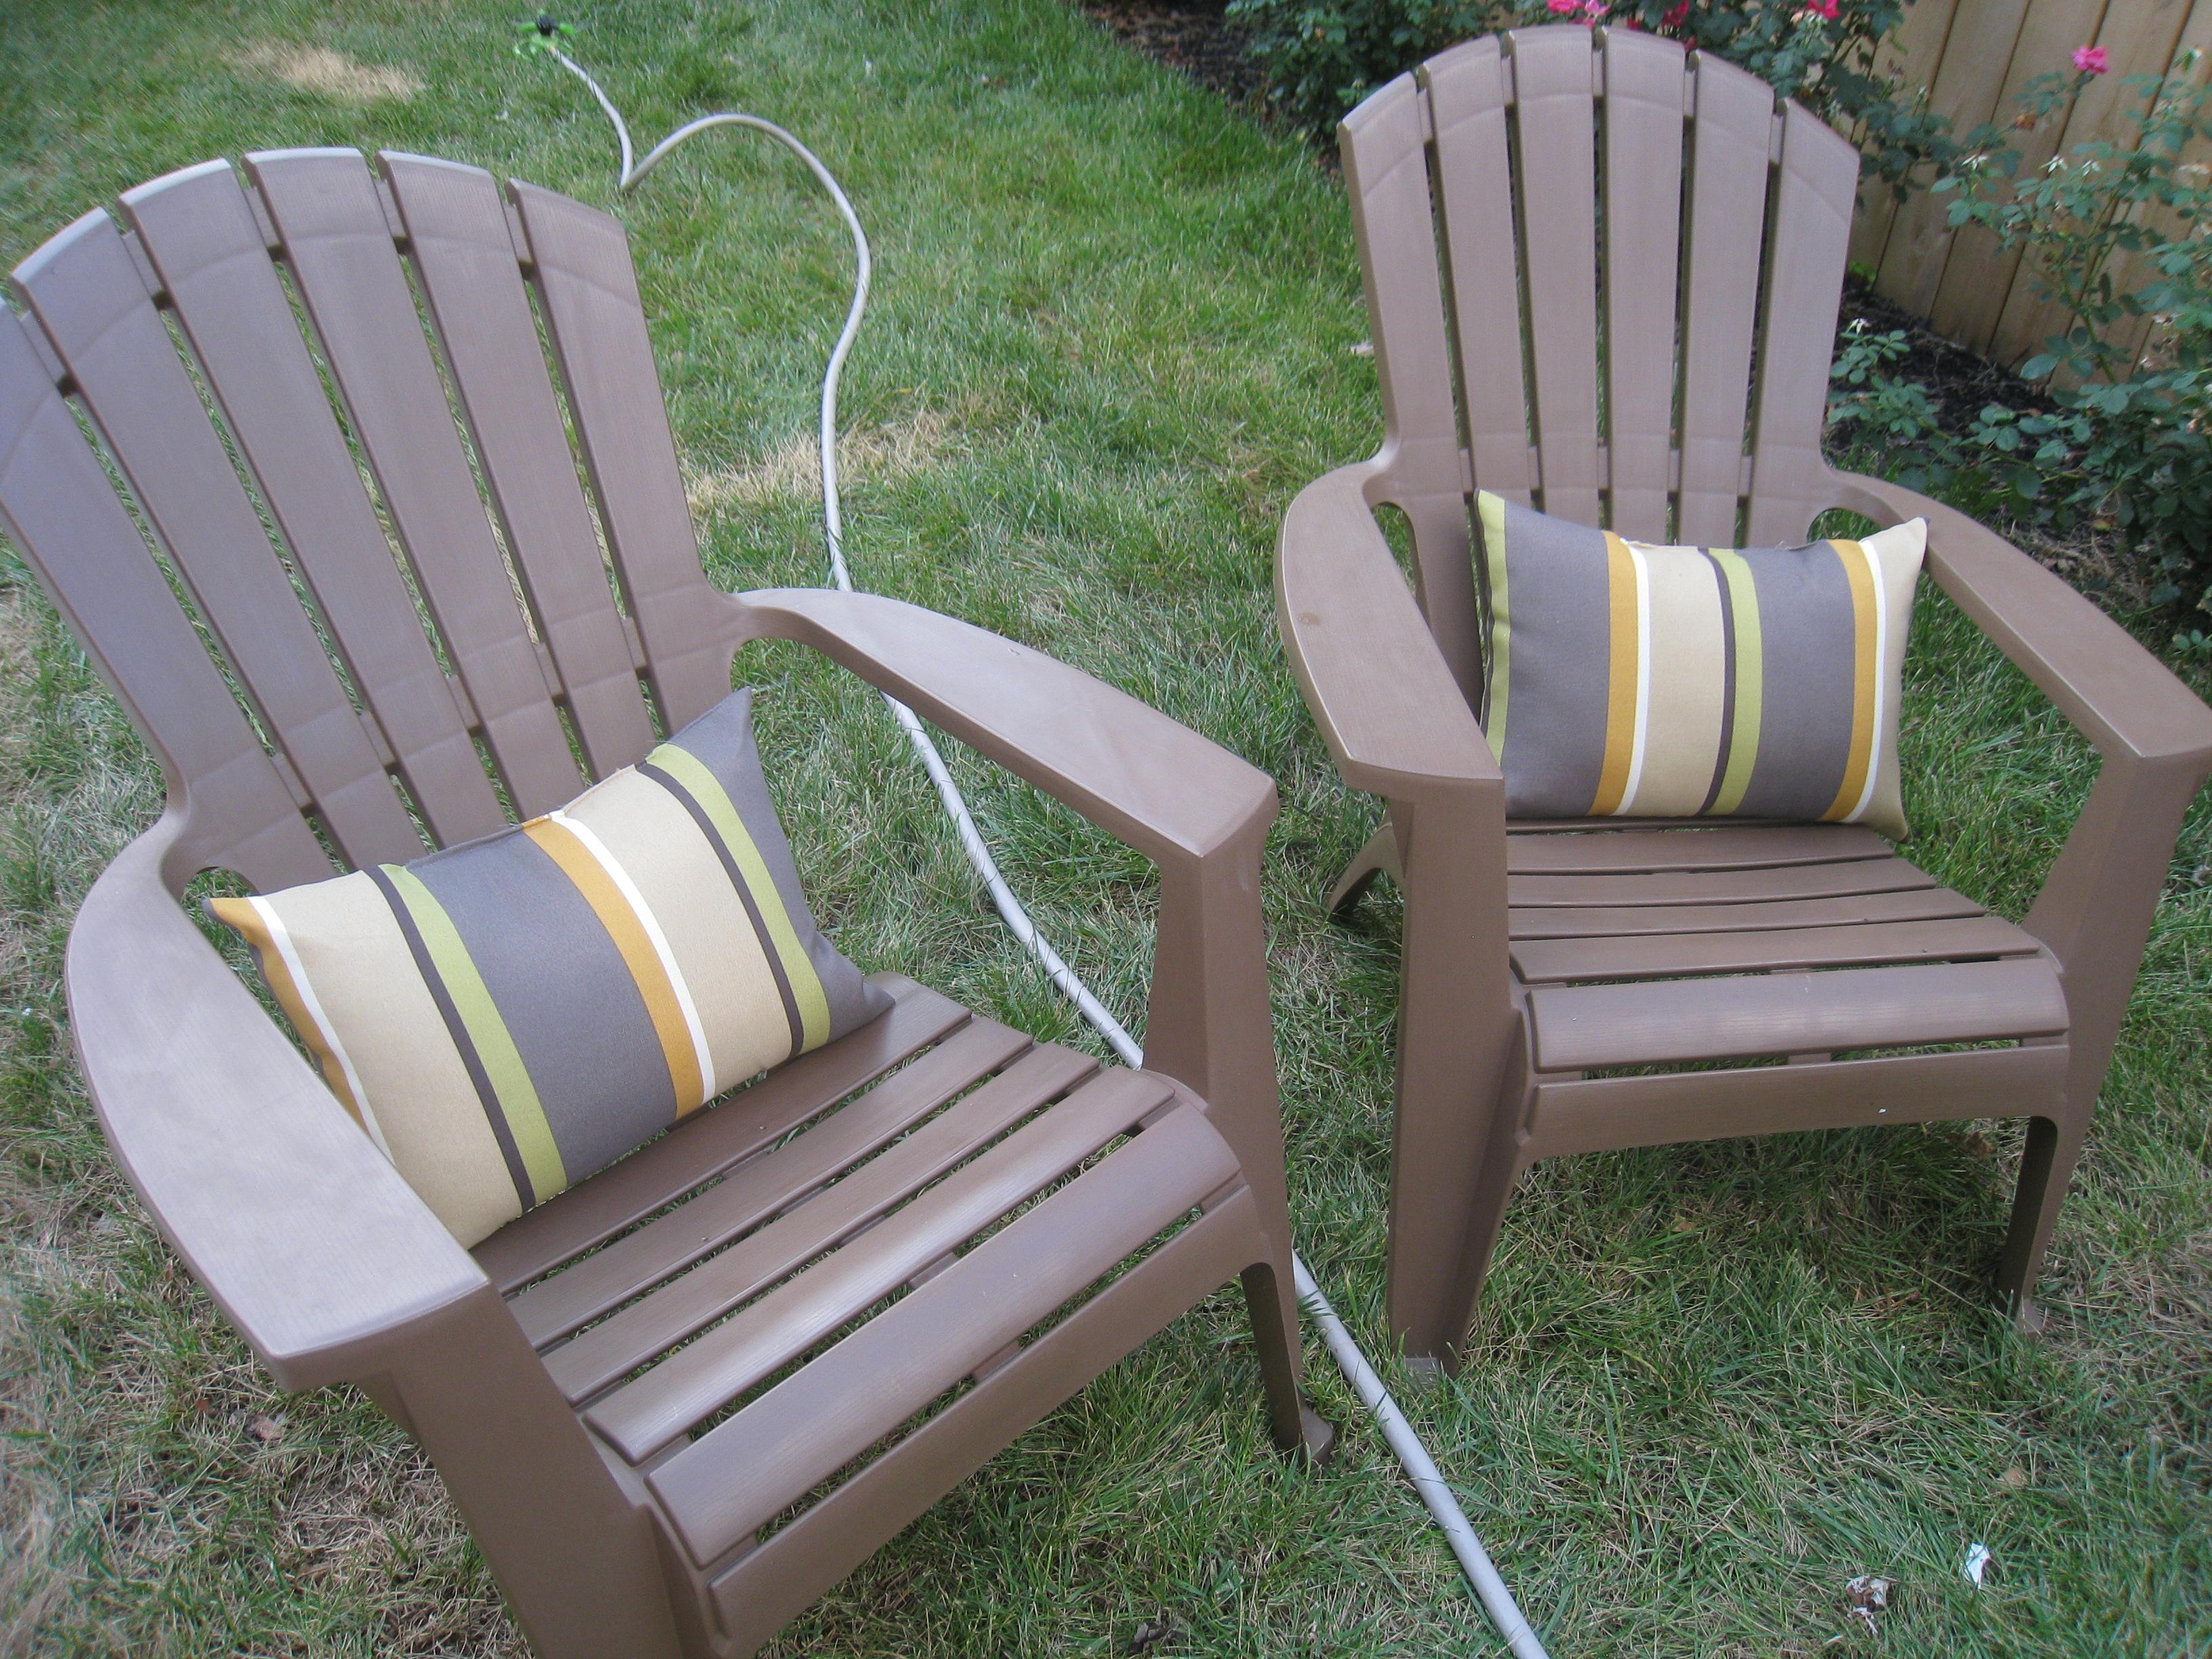 Large Adirondack Chair Plans